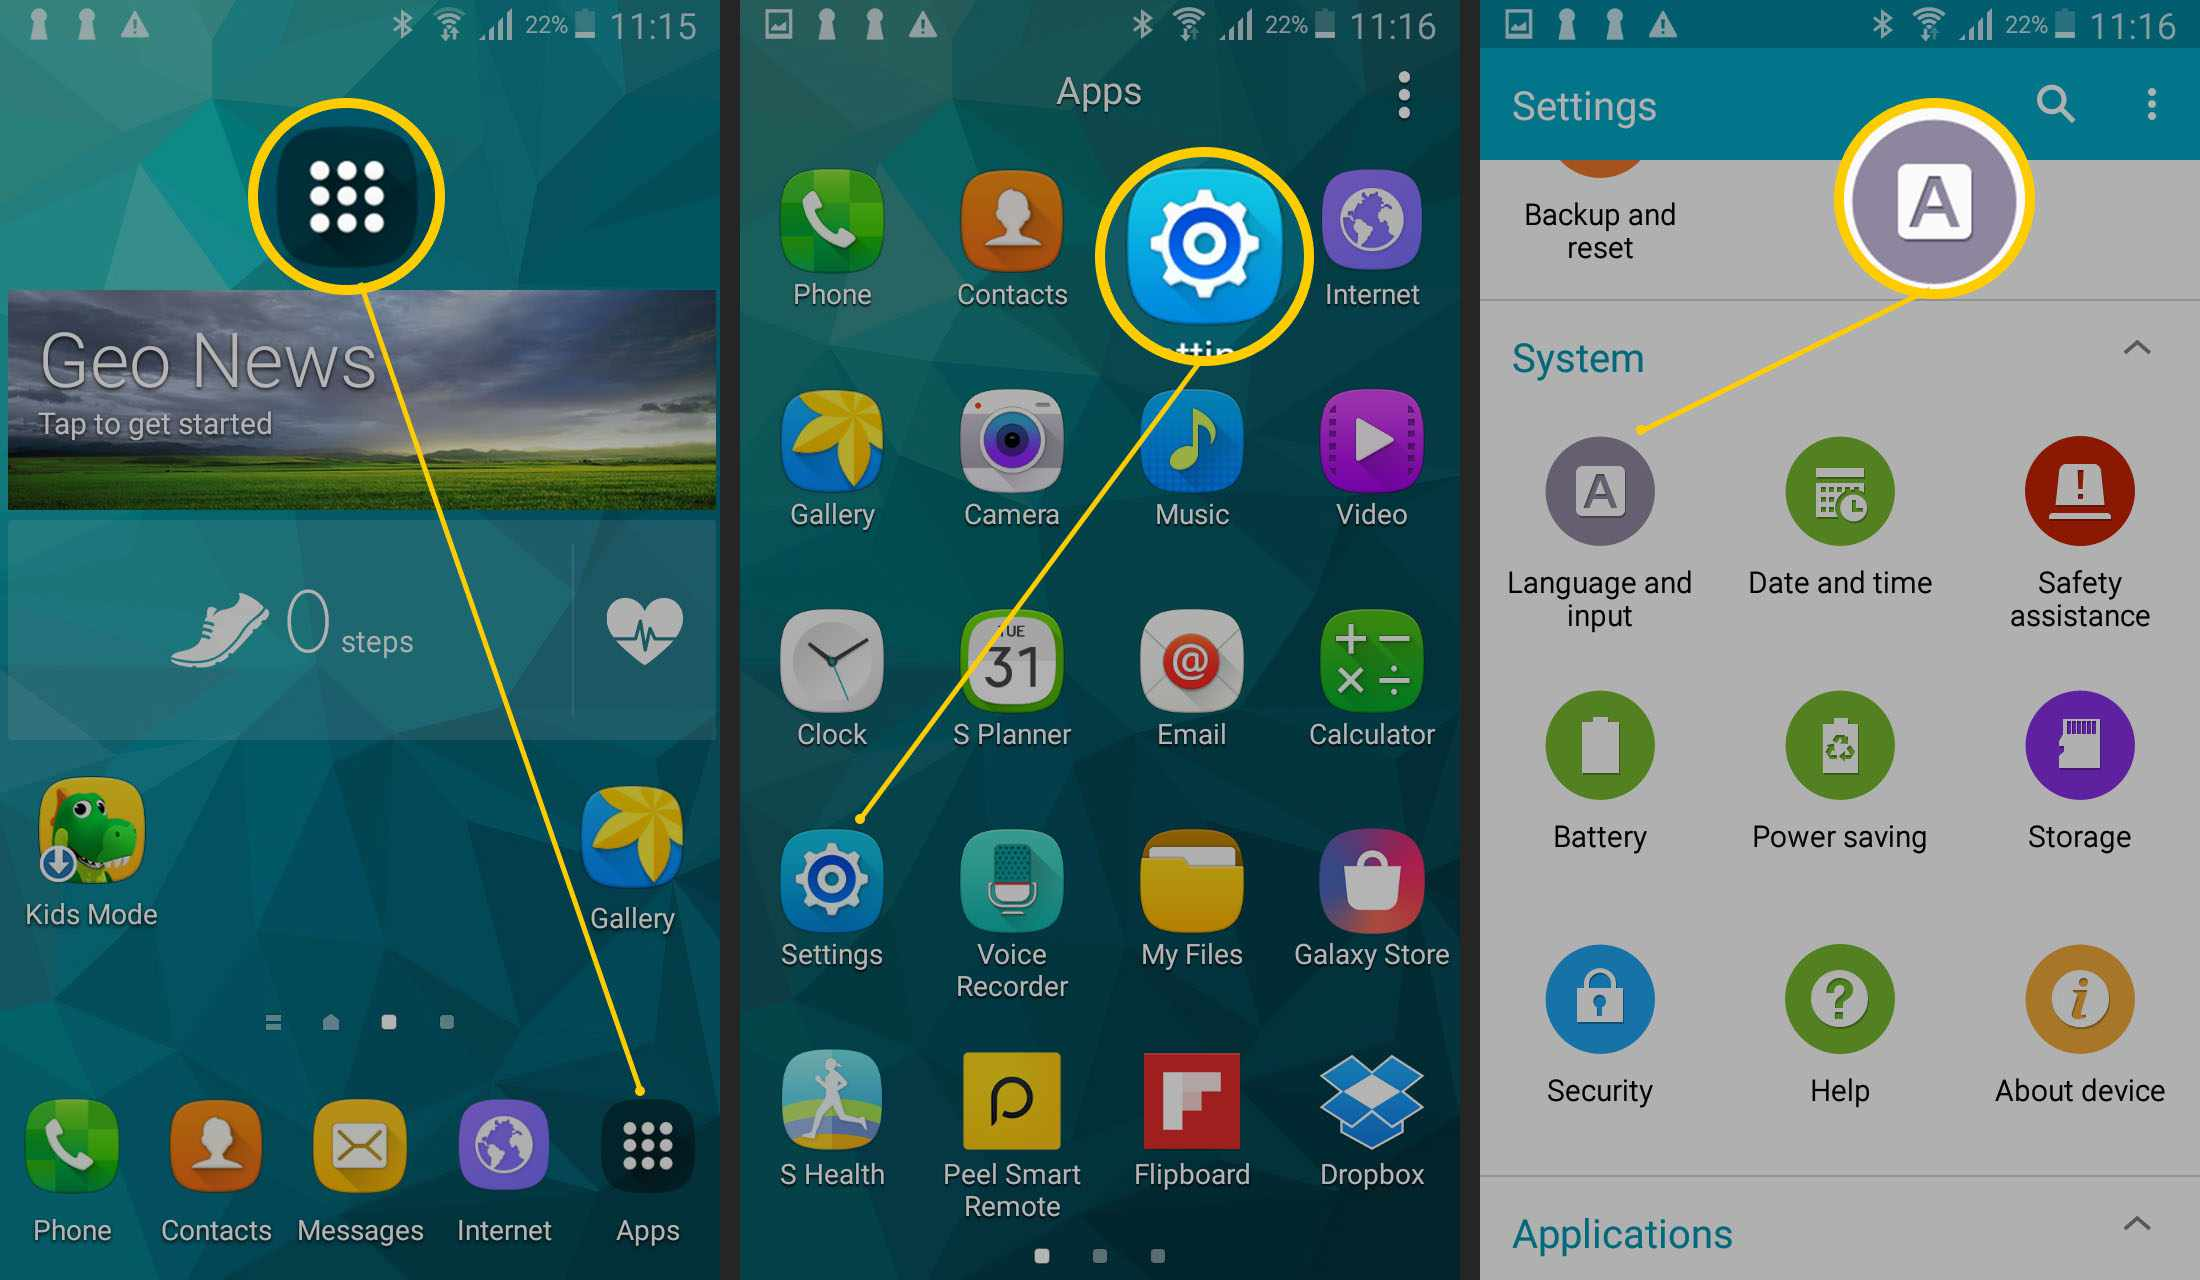 Samsung smartphone home screen and Settings screen